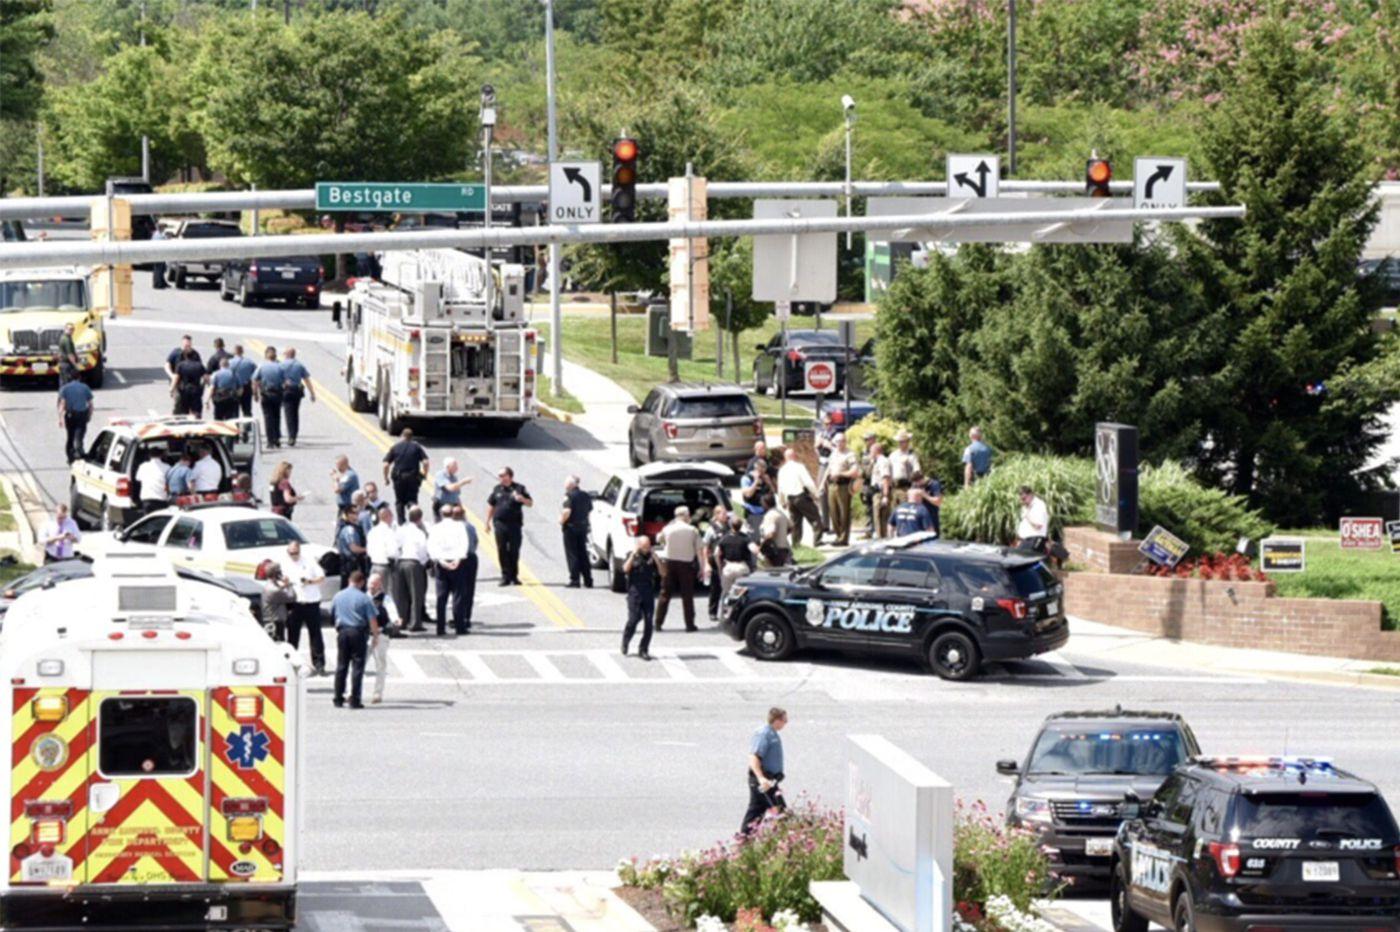 Annapolis shooting at Capital Gazette newspaper leaves 5 dead